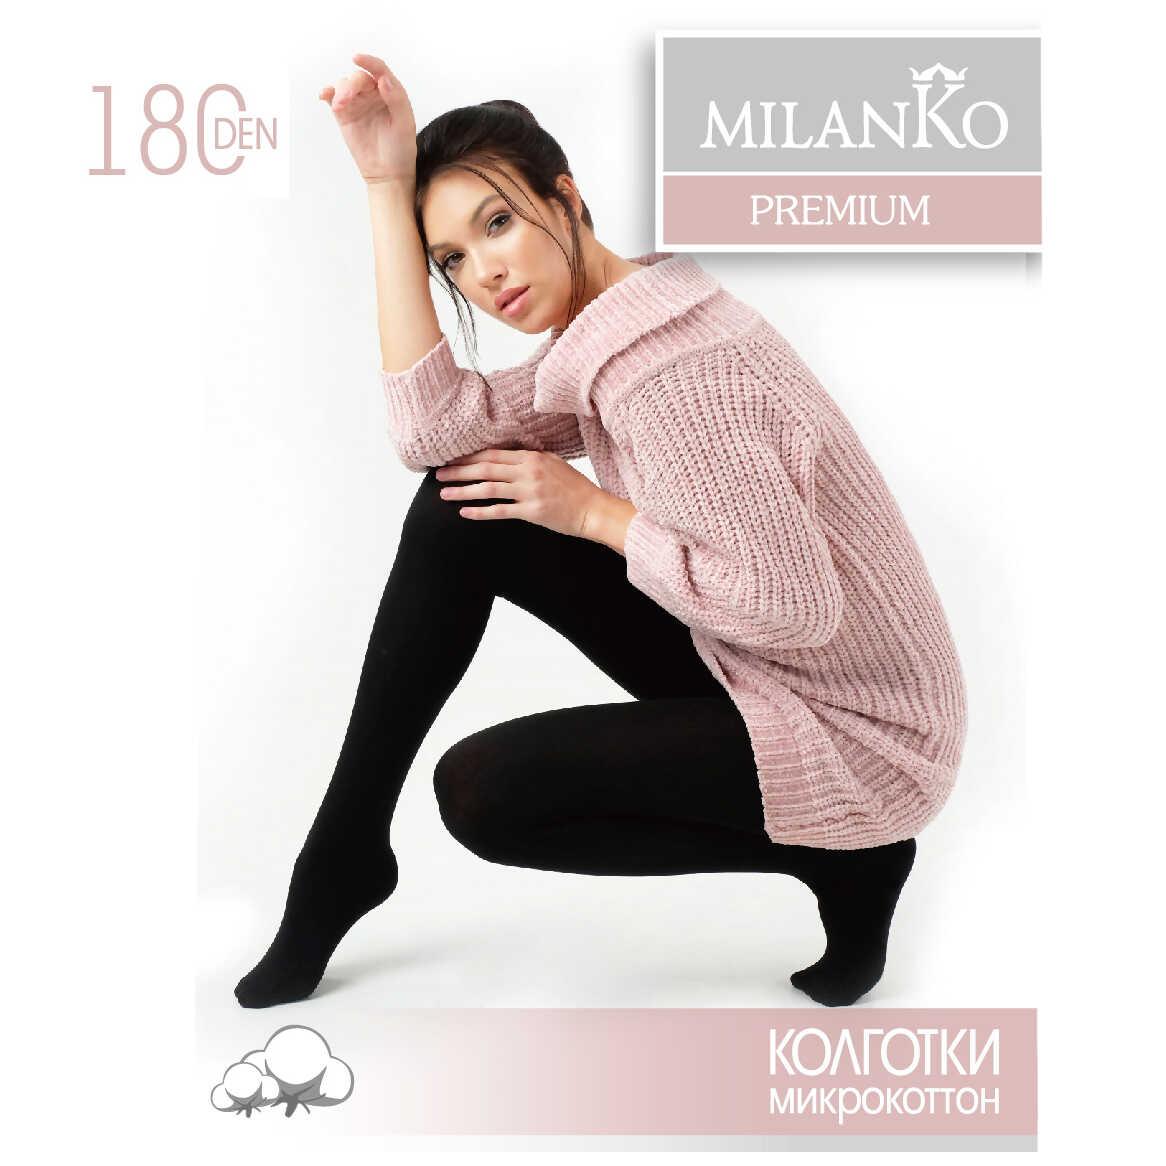 Женские колготки микрокоттон NEW MilanKo K-037